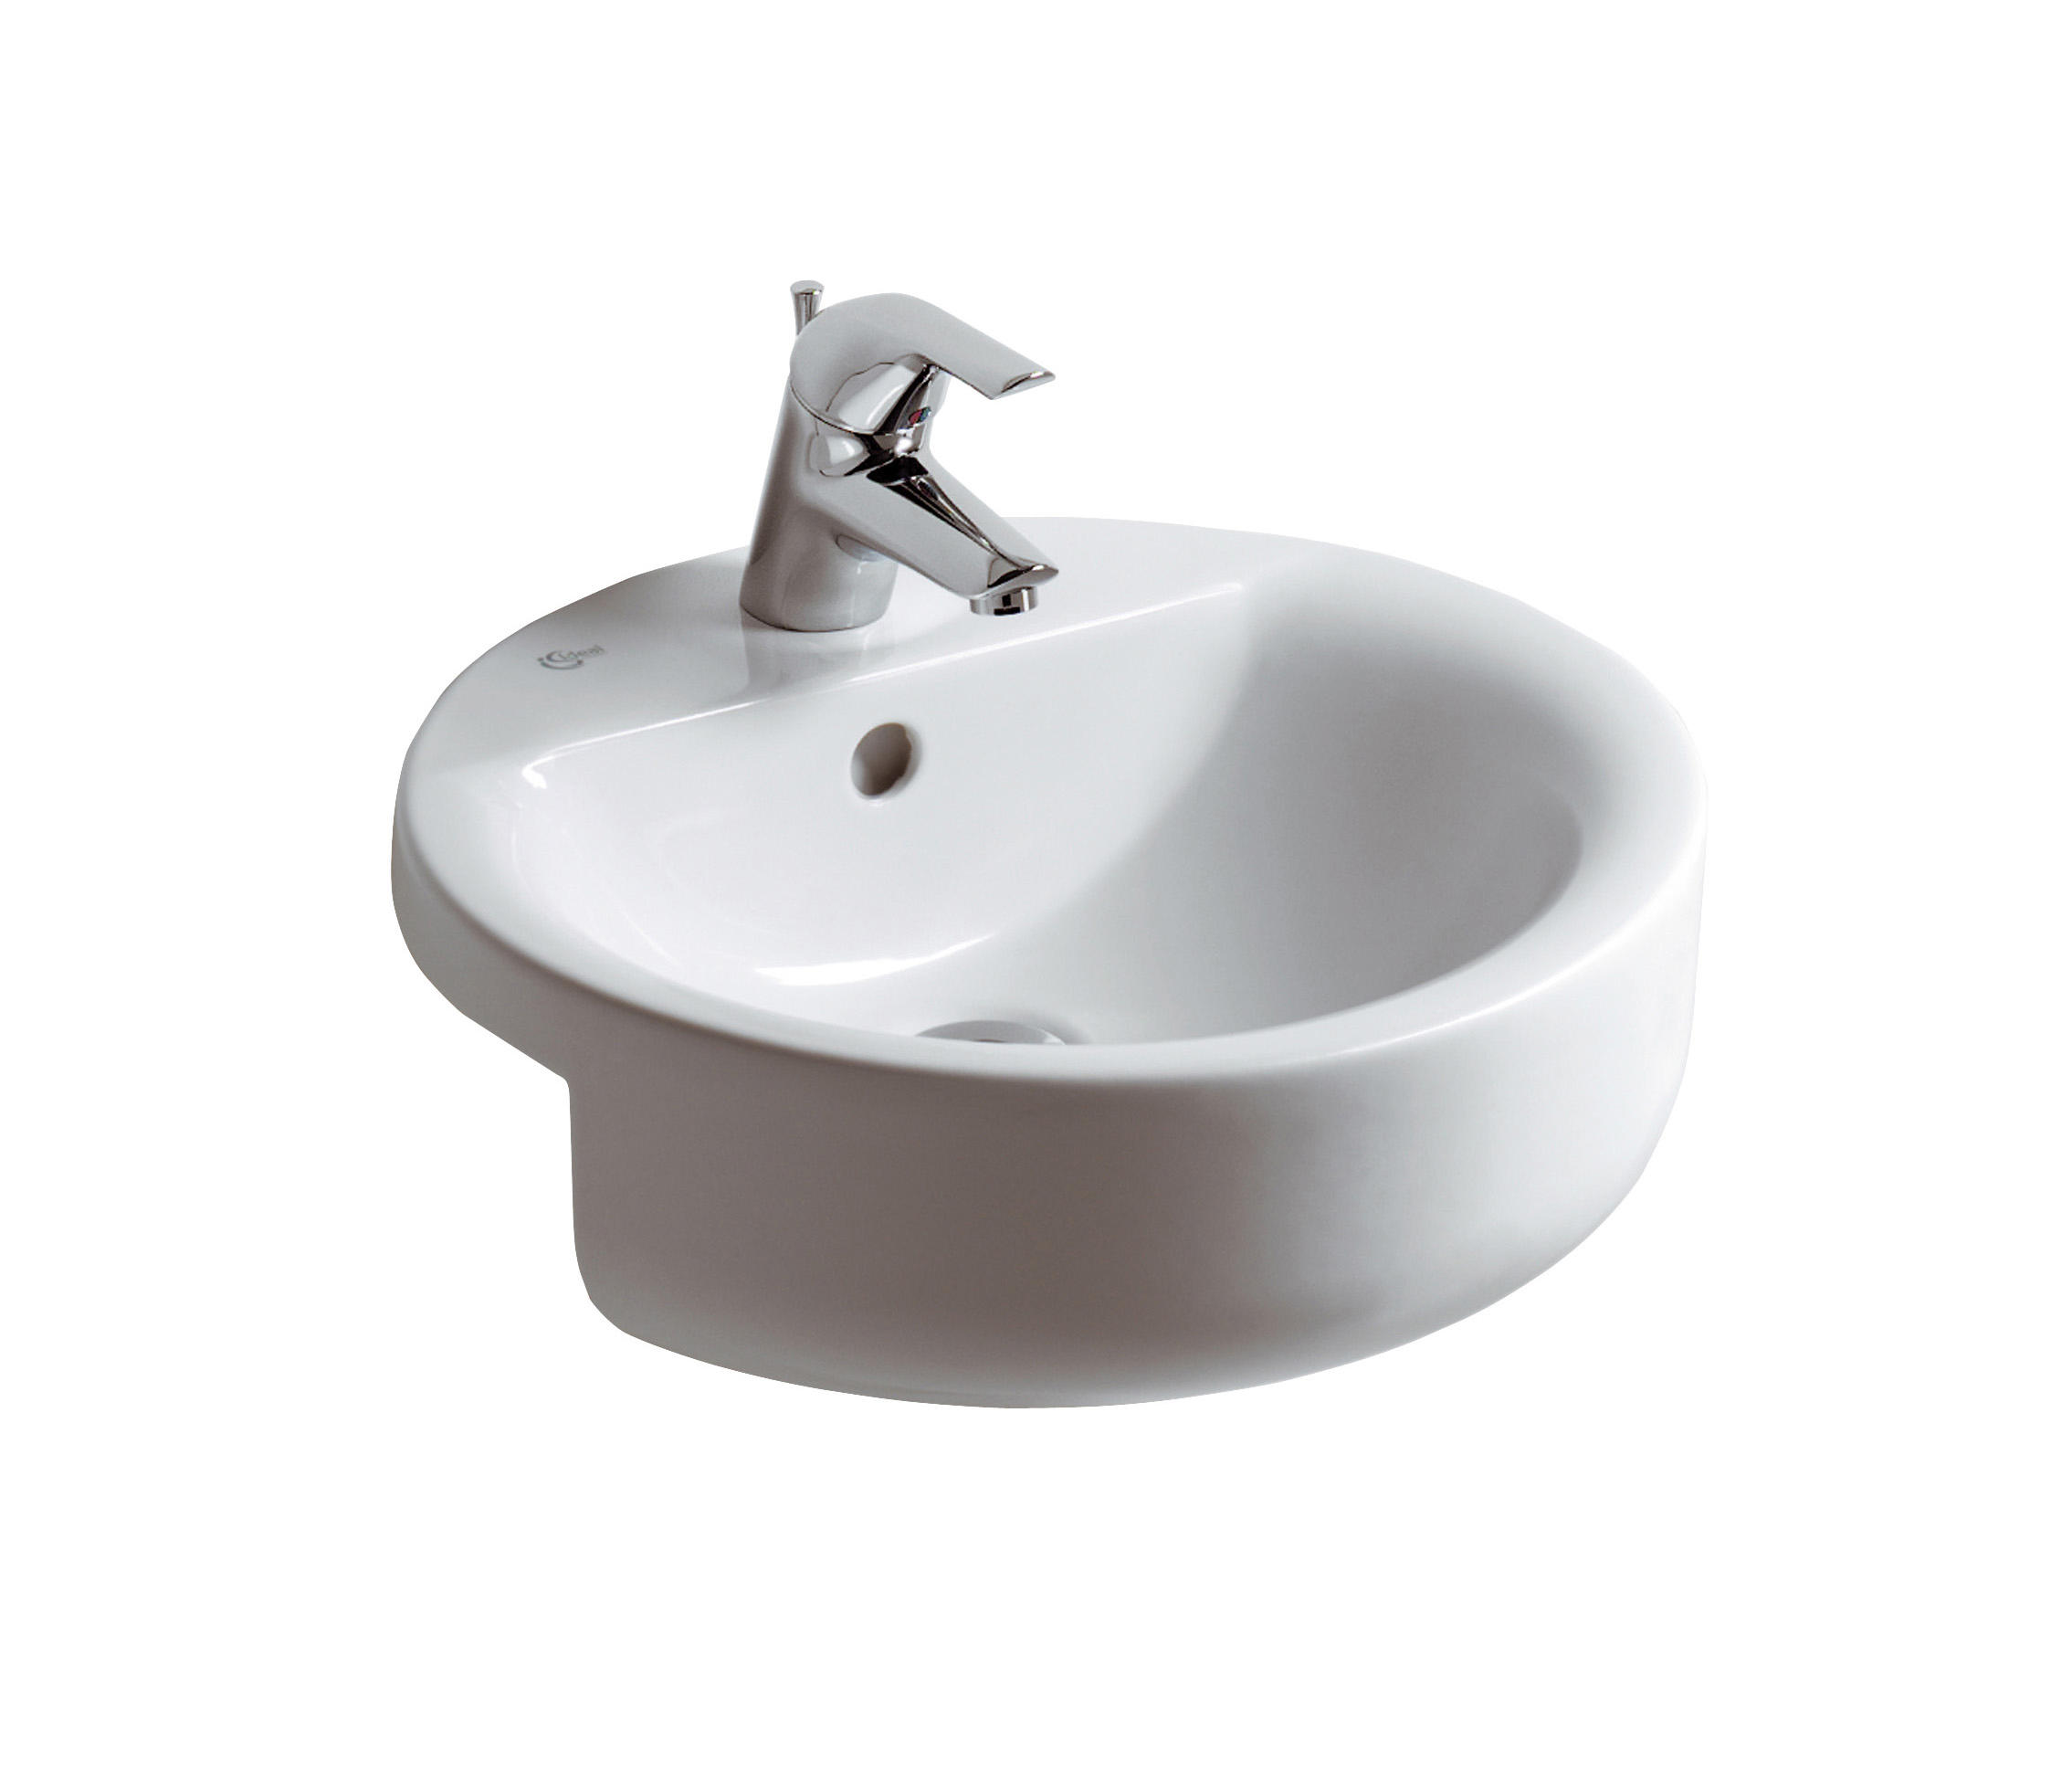 connect halbeinbauwaschtisch sphere 450mm waschtische. Black Bedroom Furniture Sets. Home Design Ideas